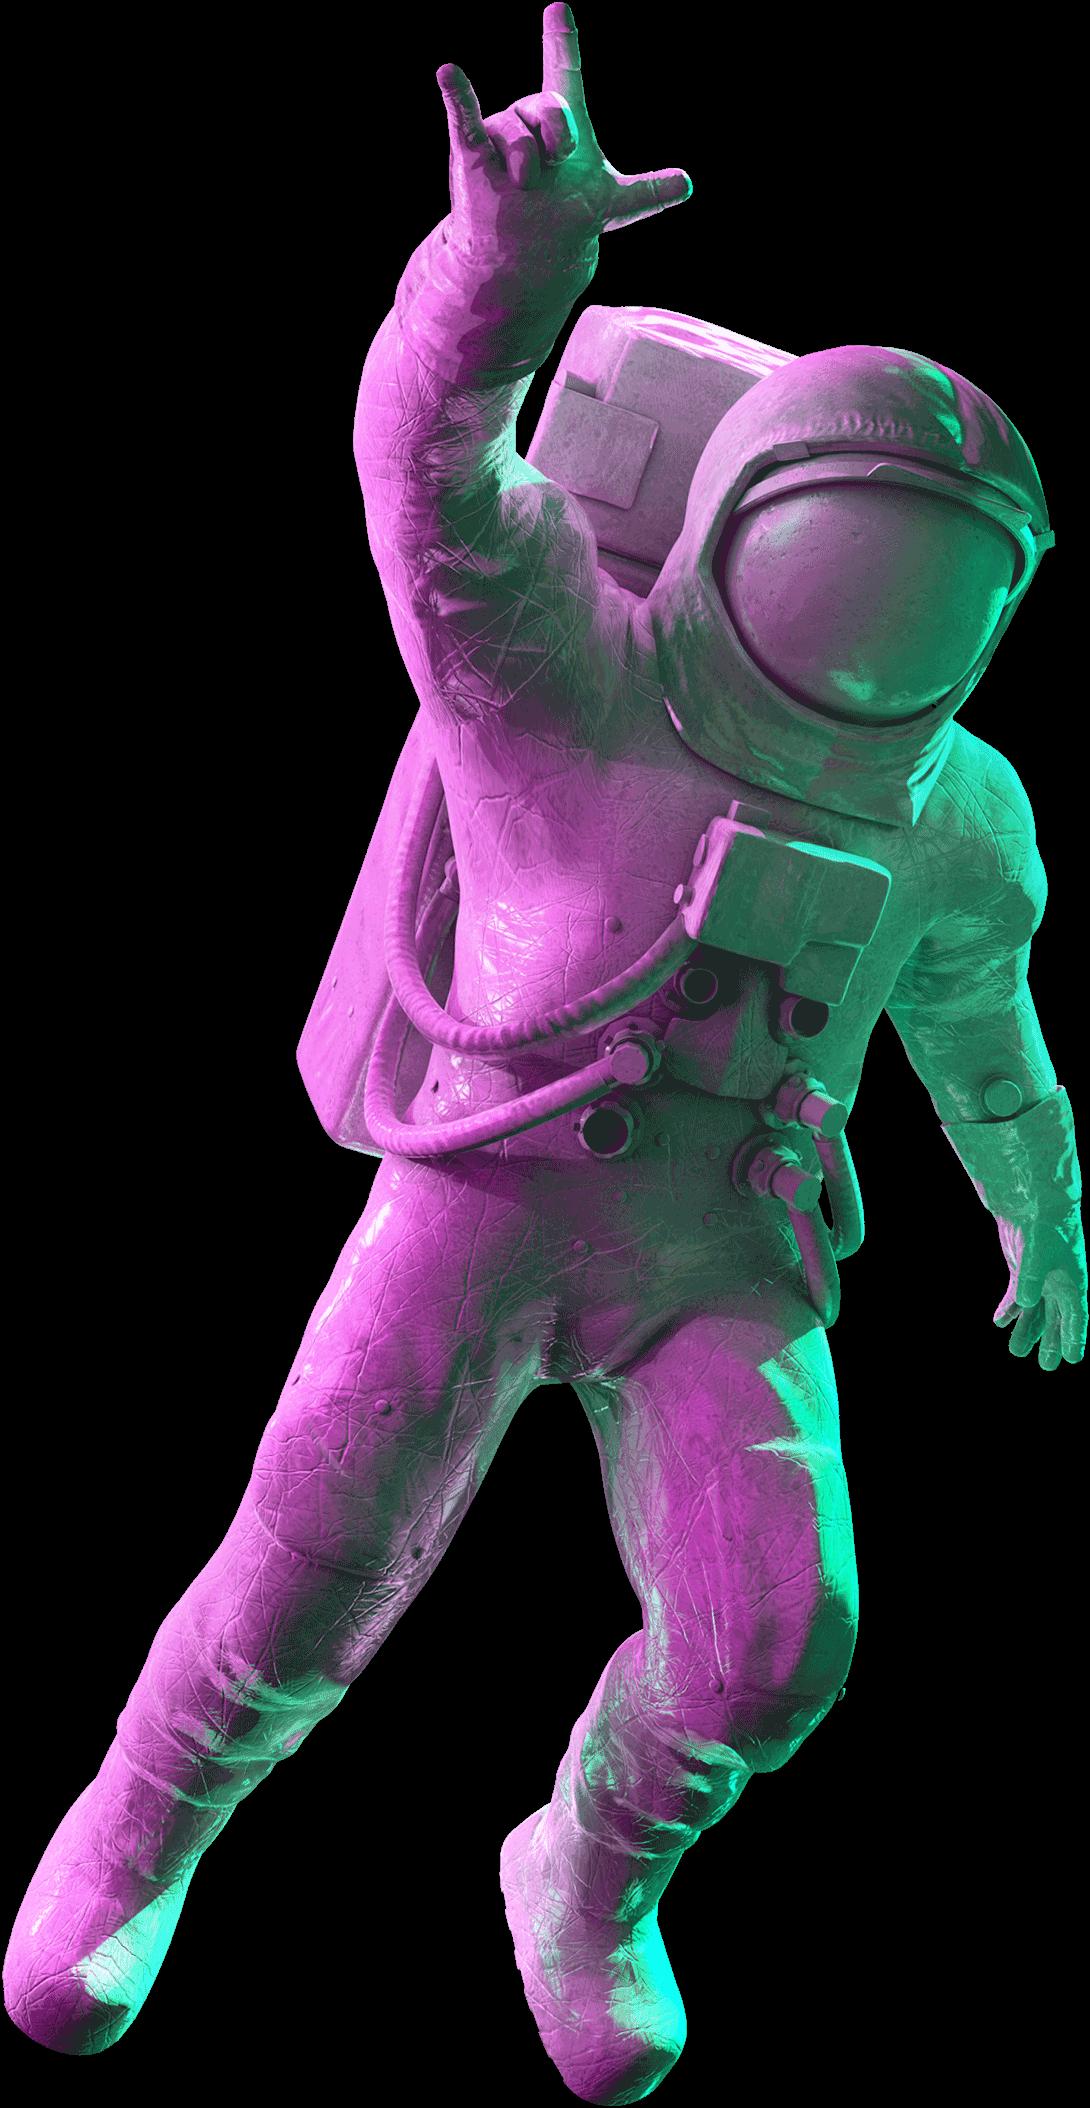 MajorMega Astronaut